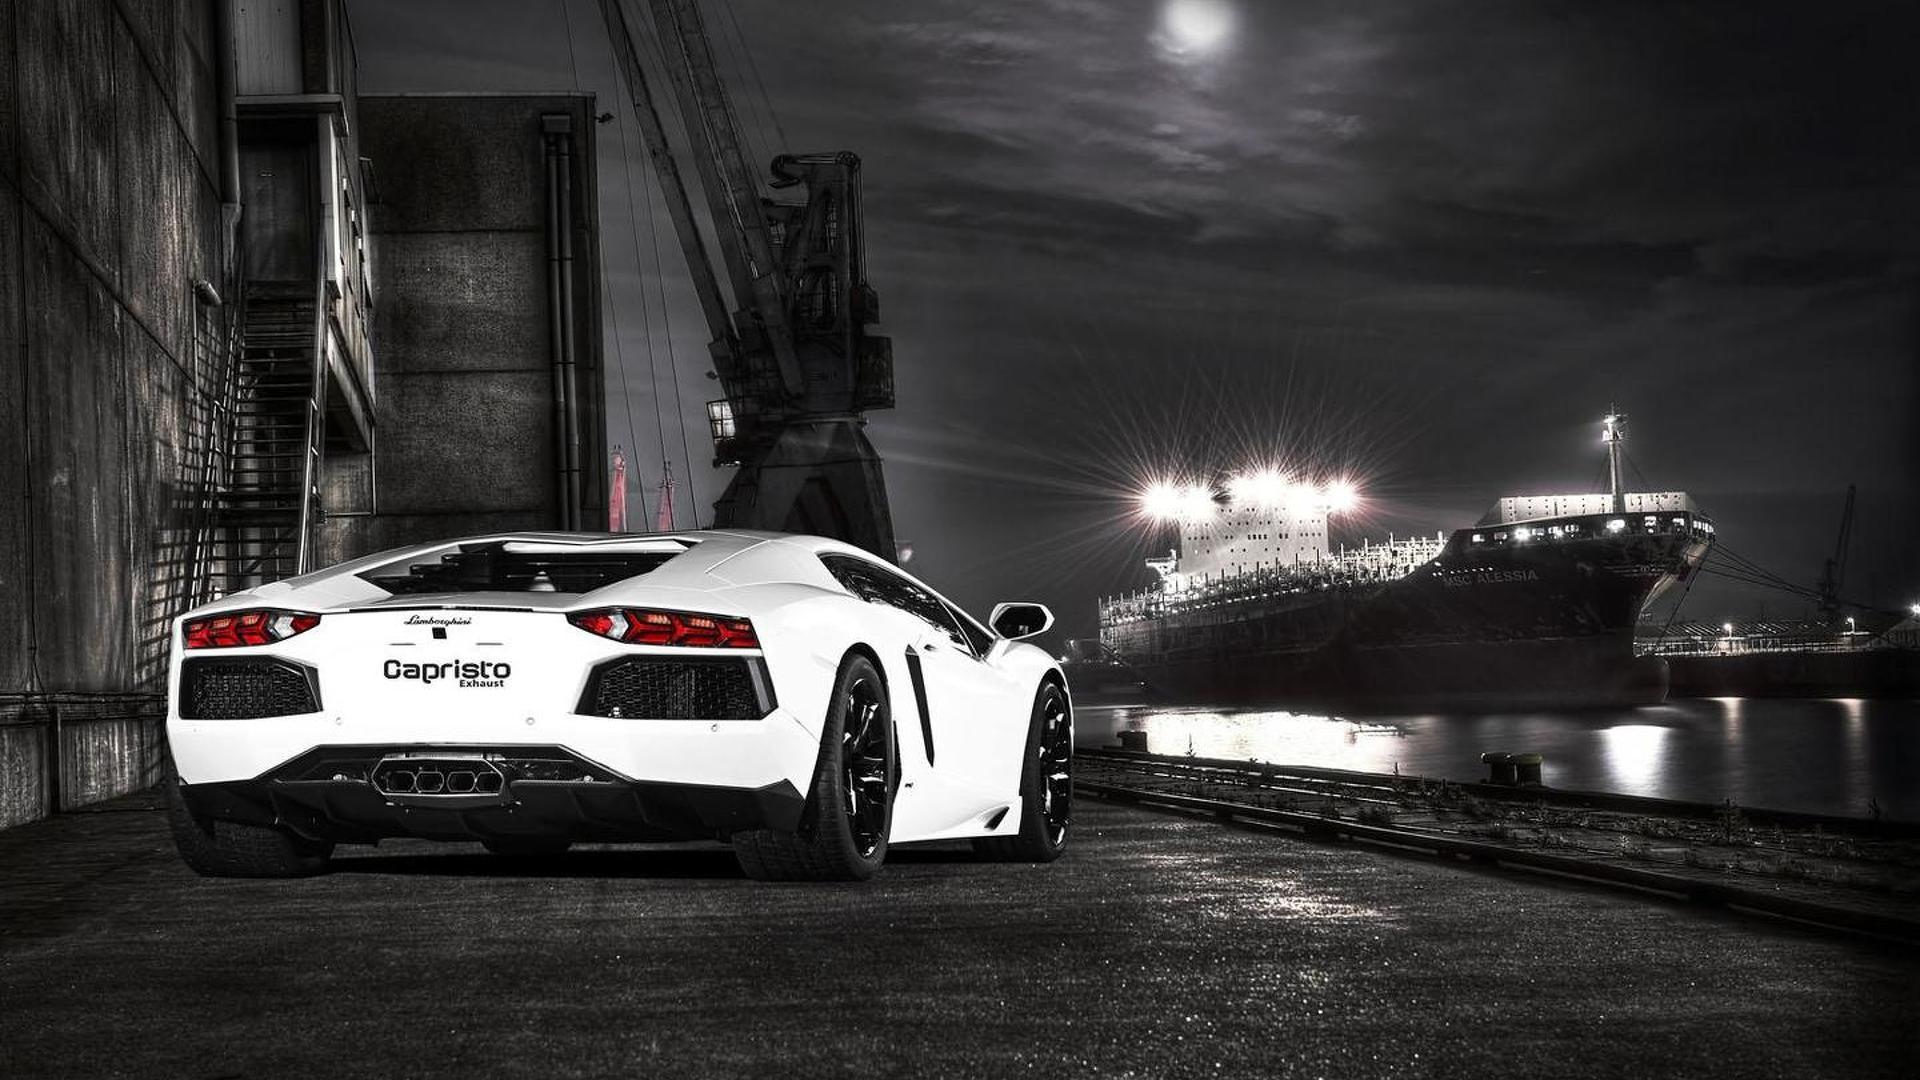 Capristo Lamborghini Aventador unveiled